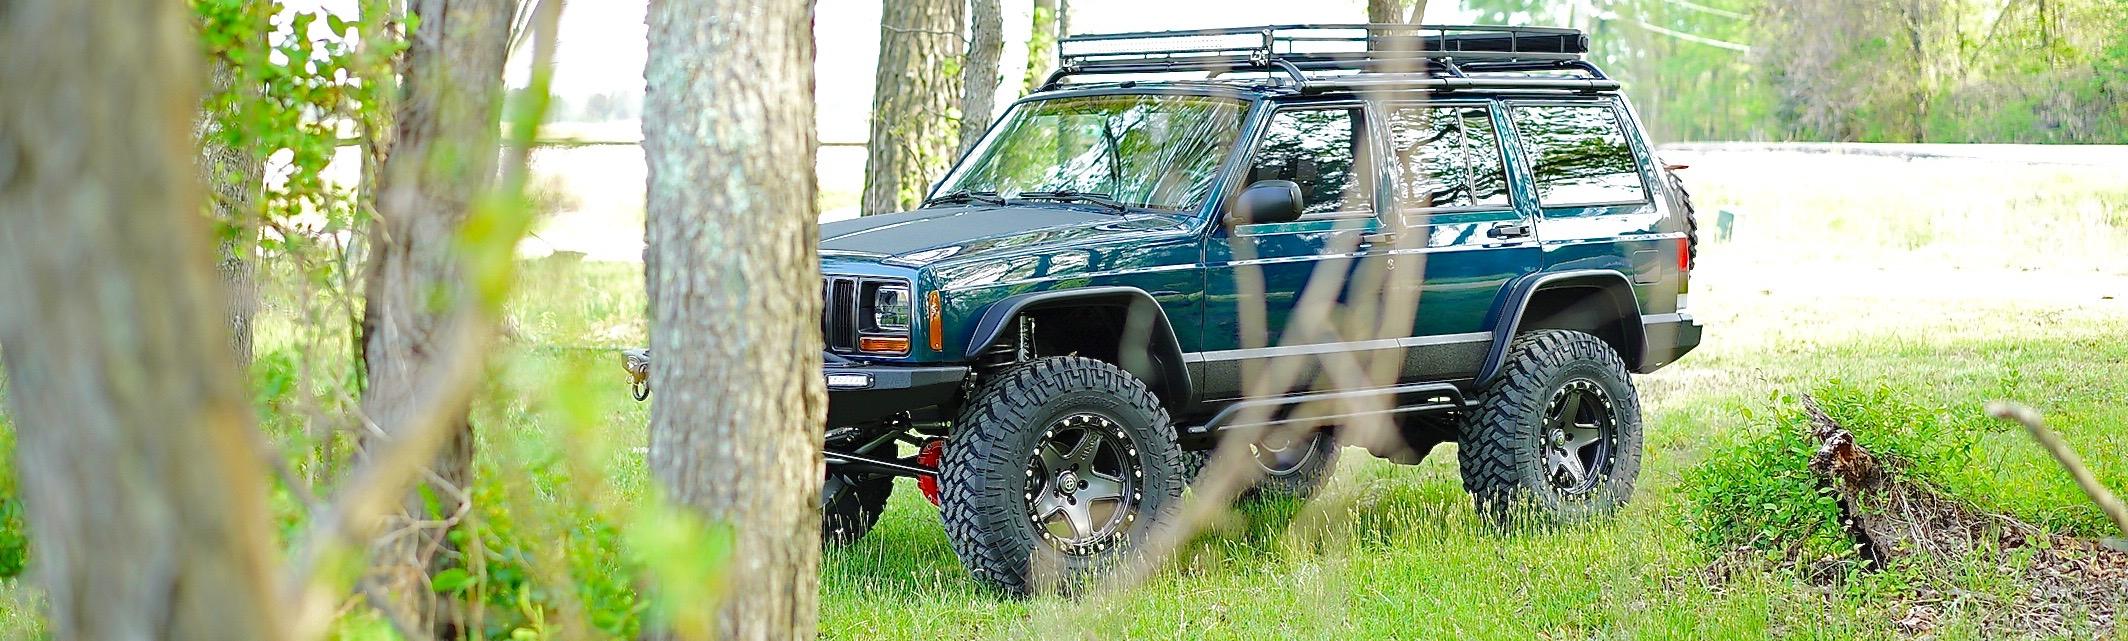 lifted jeep cherokee for sale jeep cherokee xj for sale jeep cherokee lift kit [ 2128 x 641 Pixel ]